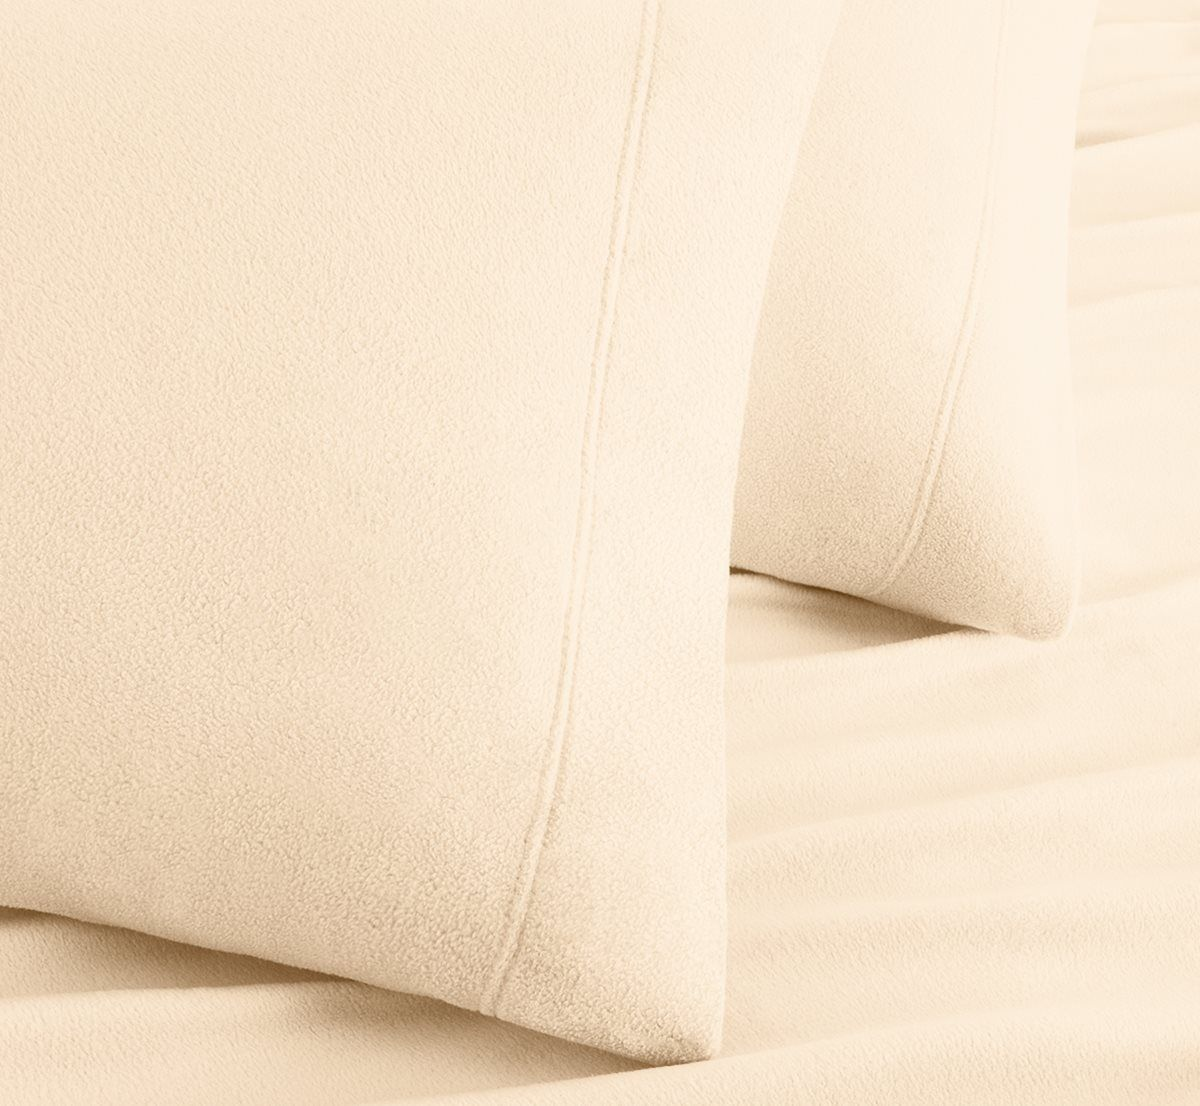 SHEEX Performance Fleece pillowcases promise to keep you